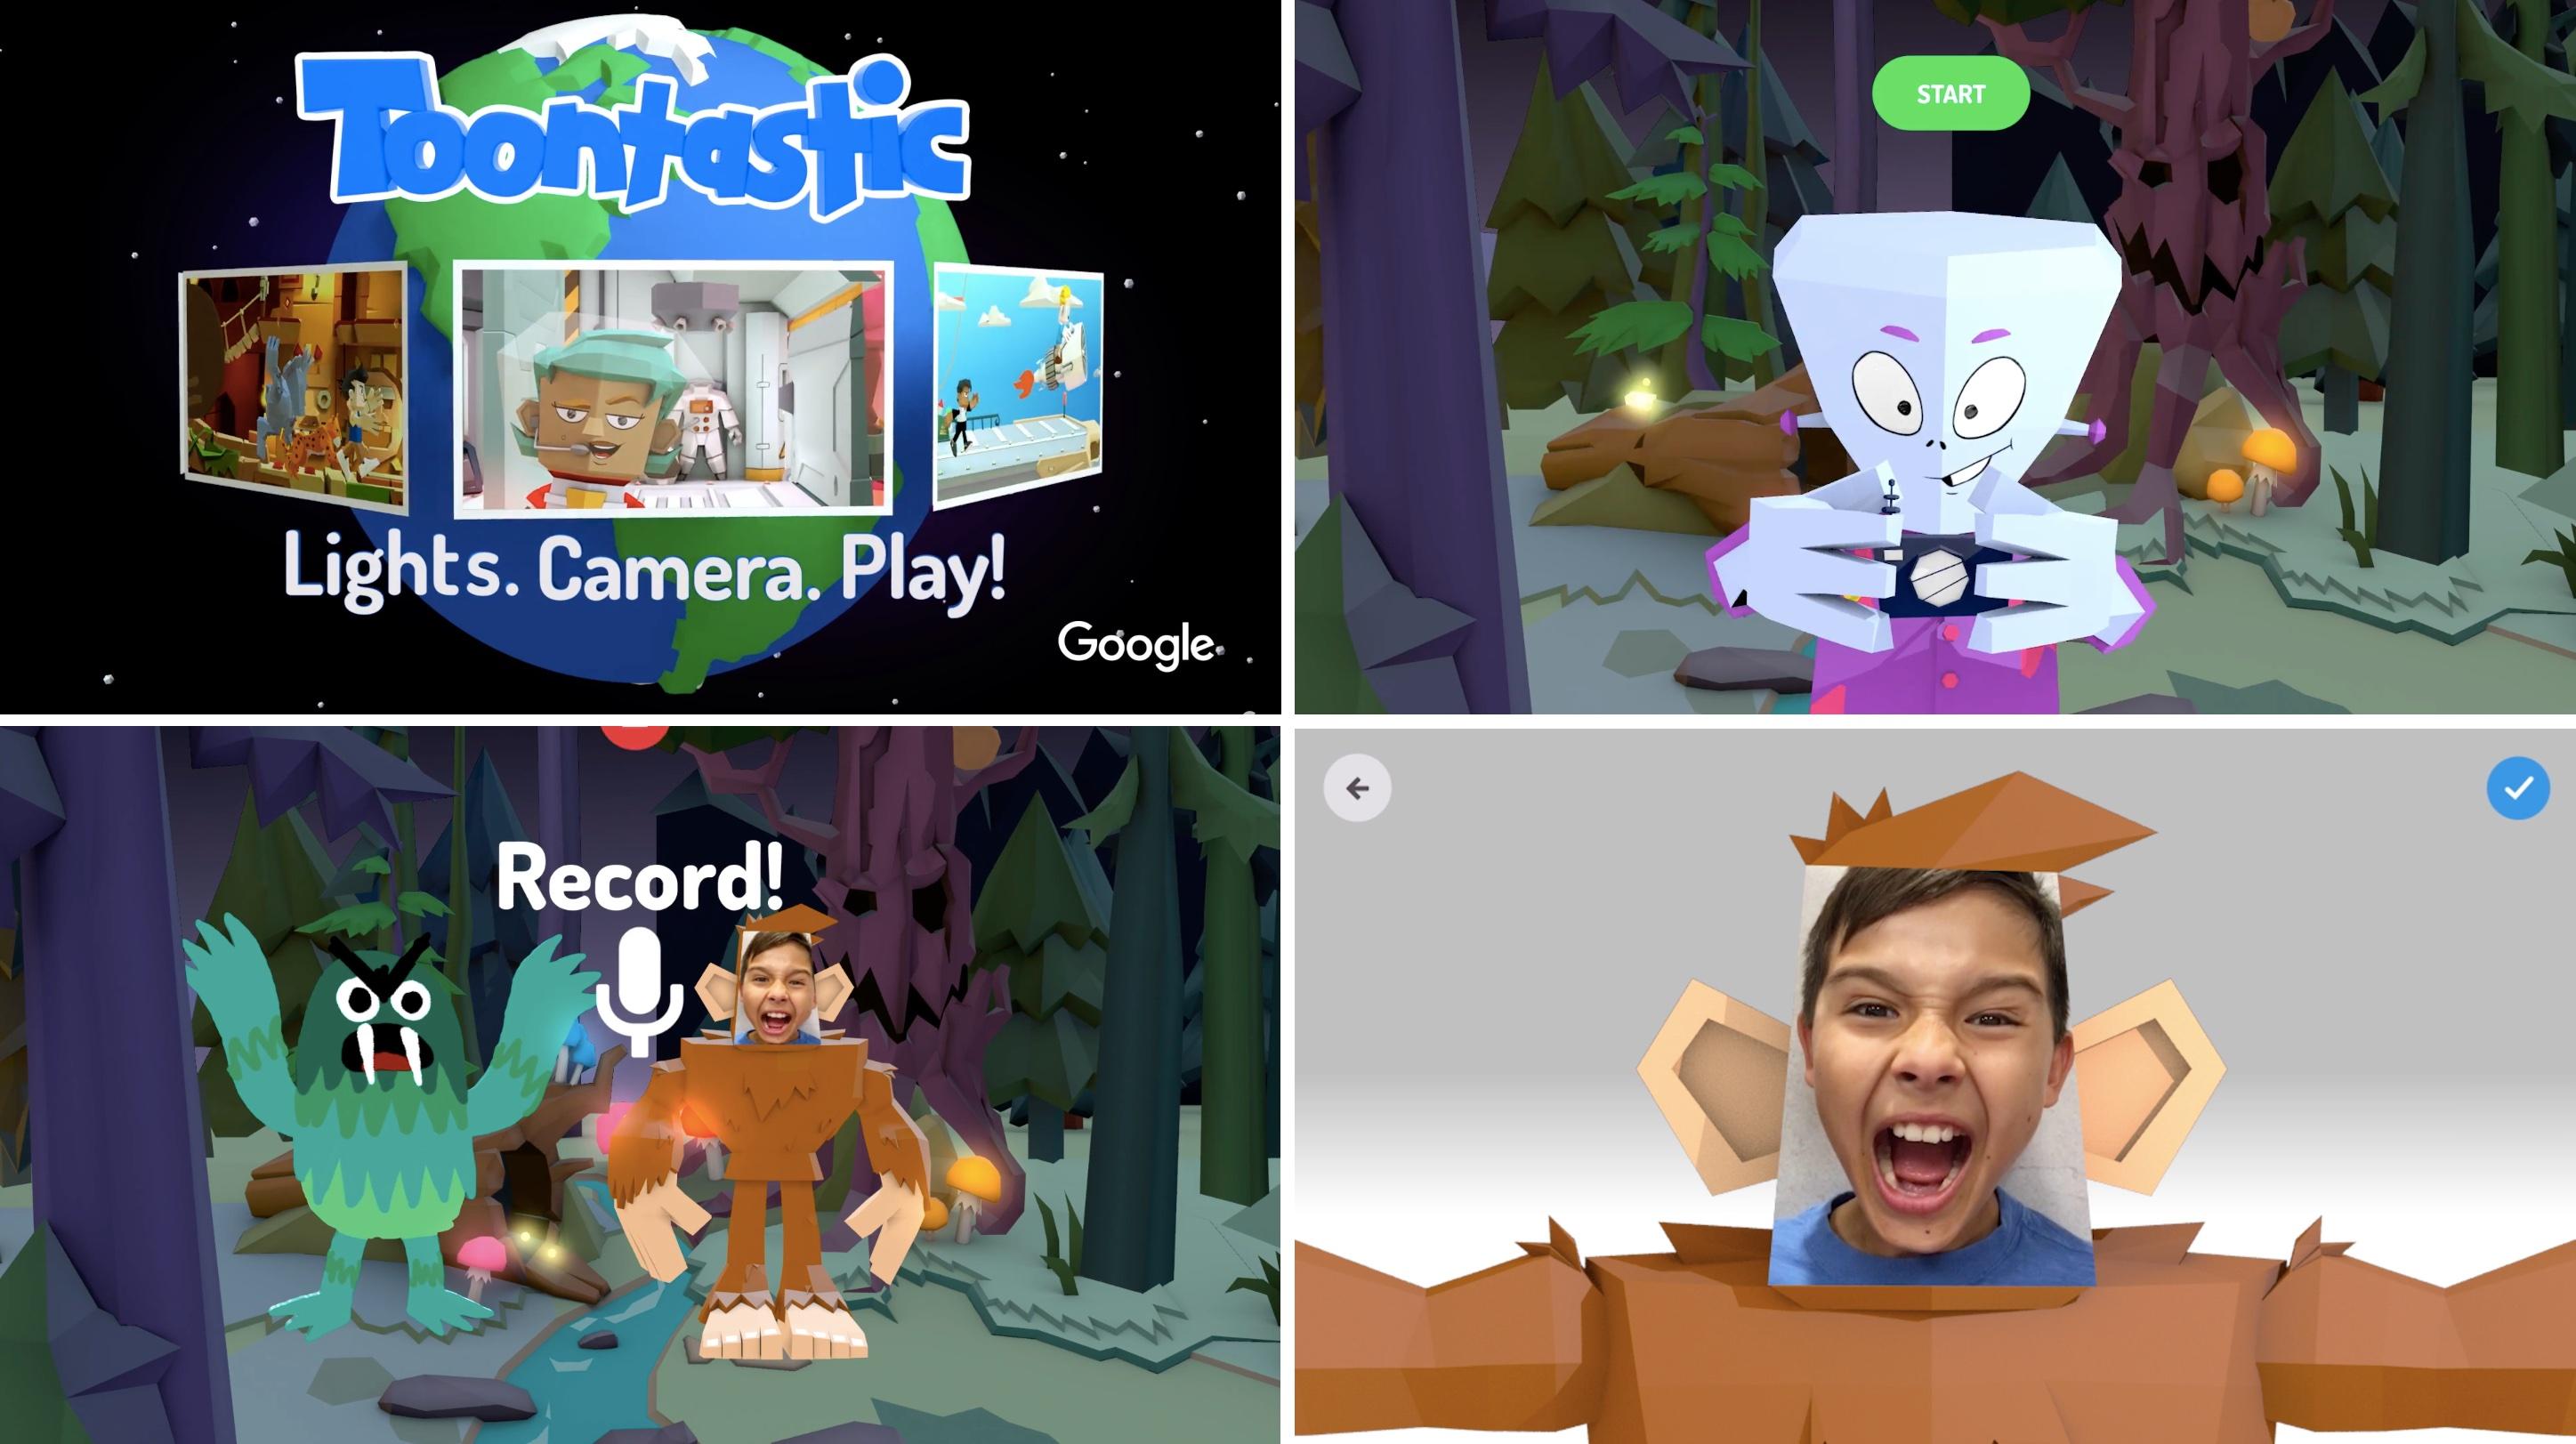 Google-Toontastic-3D App para niños: Google Toontastic 3D